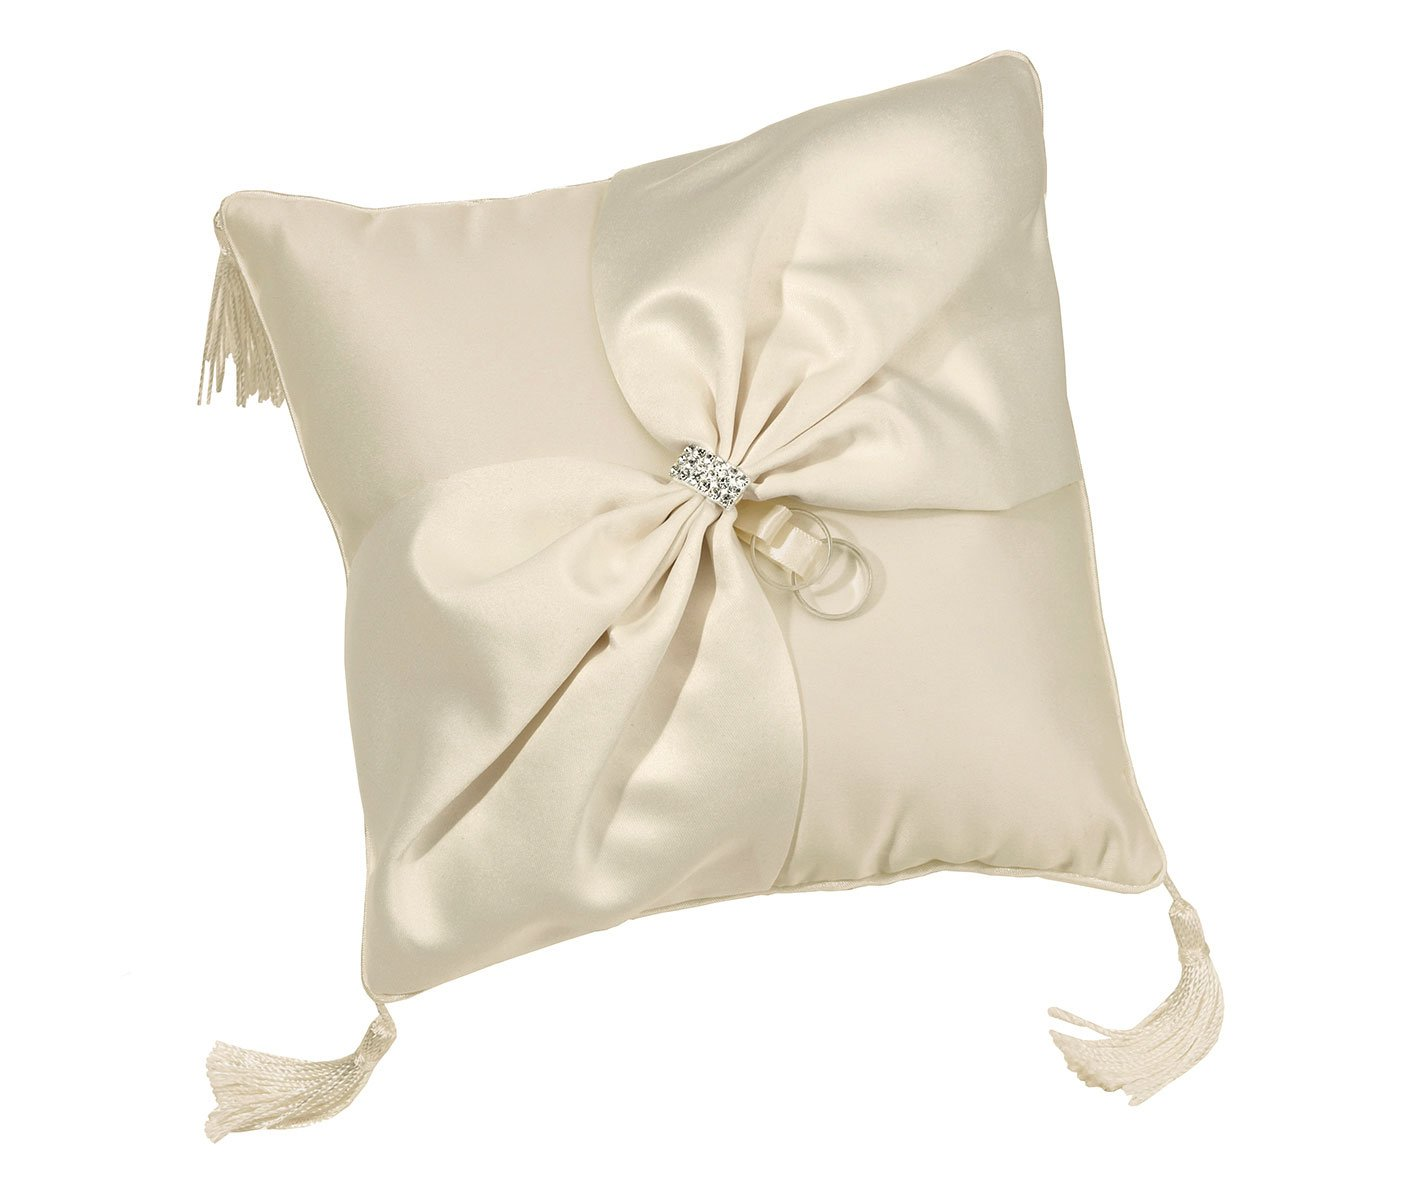 Lillian Rose Elegant Ivory Satin Wedding Ring Pillow by Lillian Rose